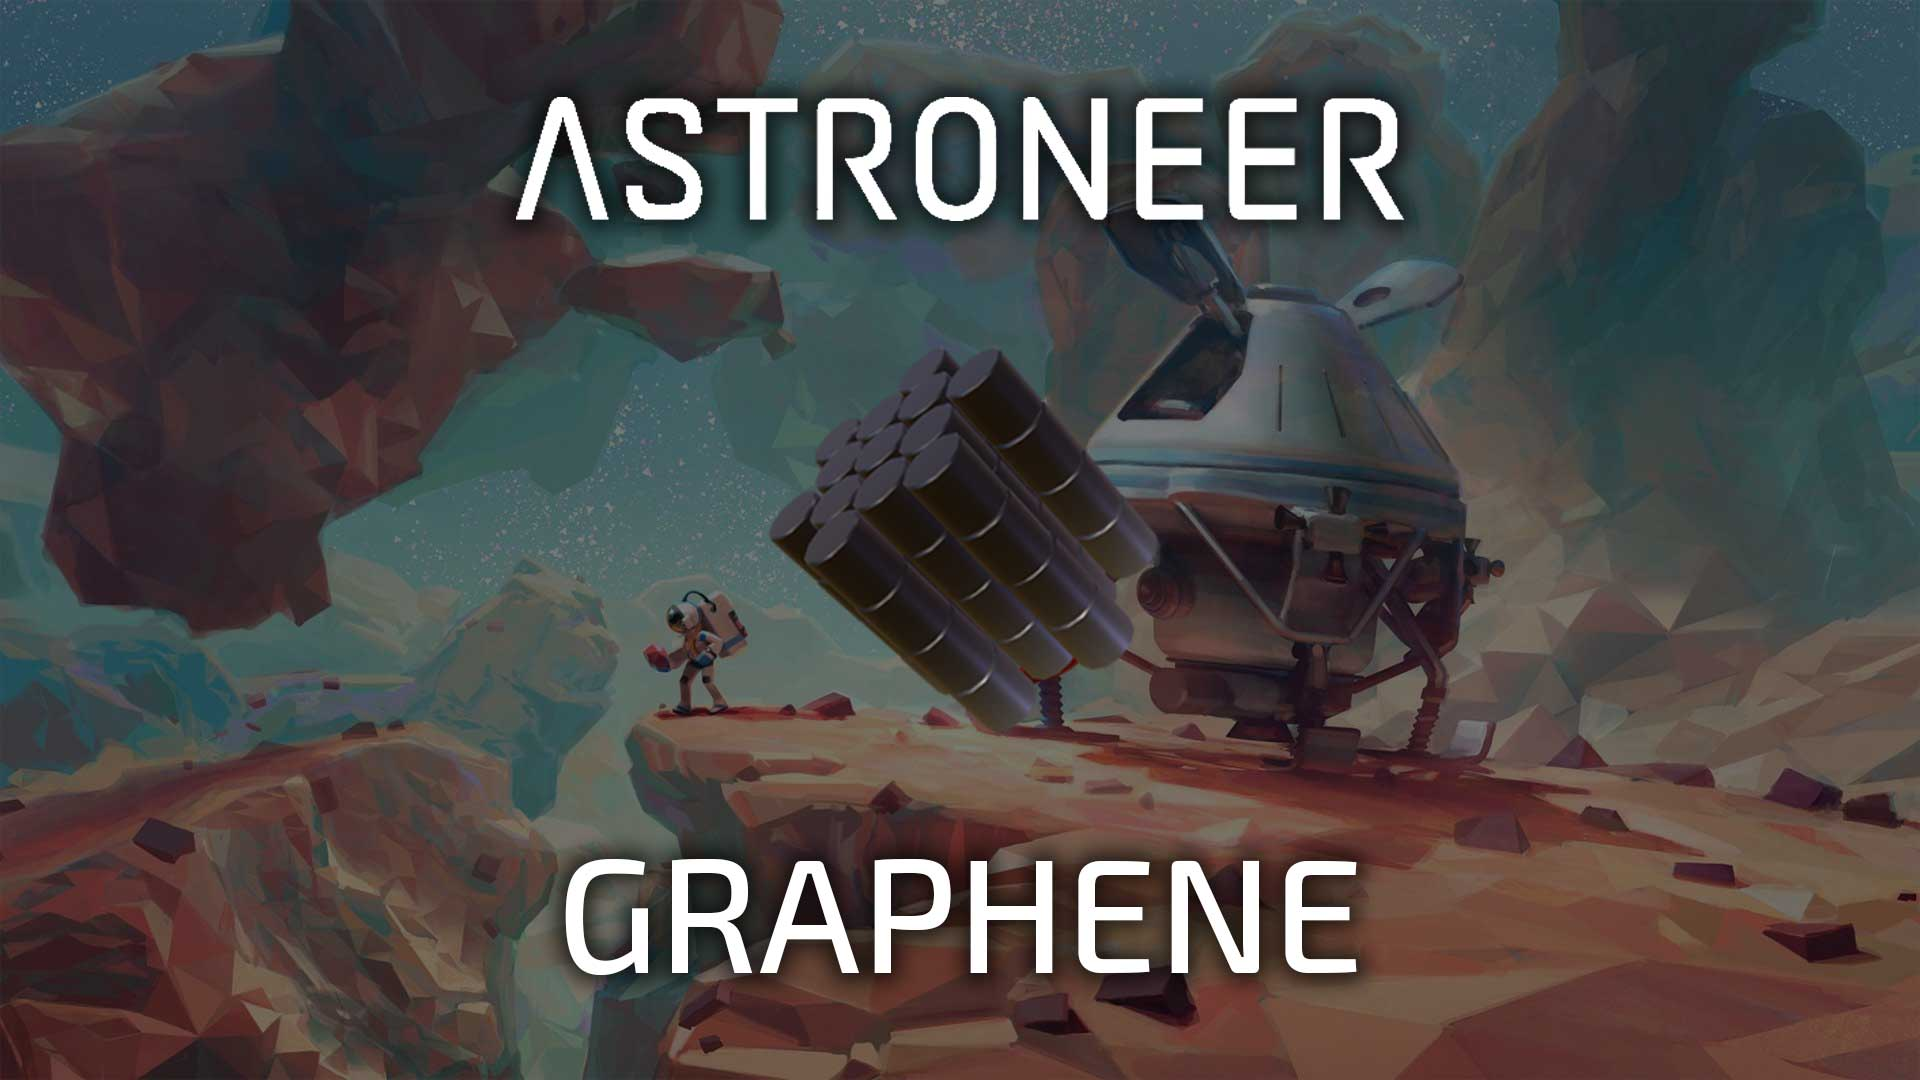 astroneer graphene